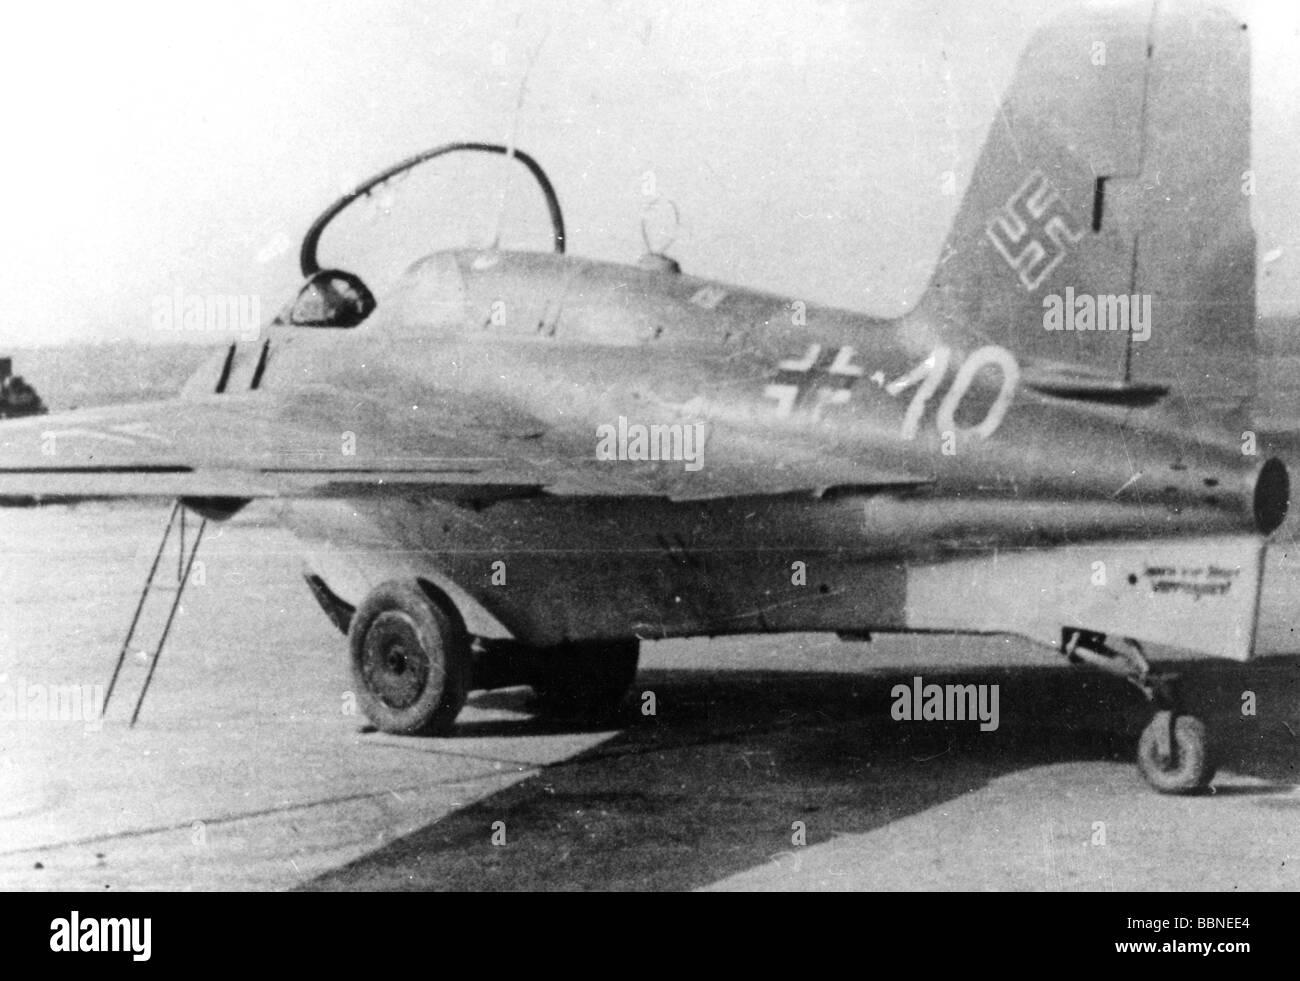 Me 163B Komet - Hasegawa - 1/32 (FINI) - Page 2 Evenements-seconde-guerre-mondiale-la-deuxieme-guerre-mondiale-la-guerre-aerienne-avion-fusee-allemande-avions-messerschmitt-me-163-komet-b-bbnee4